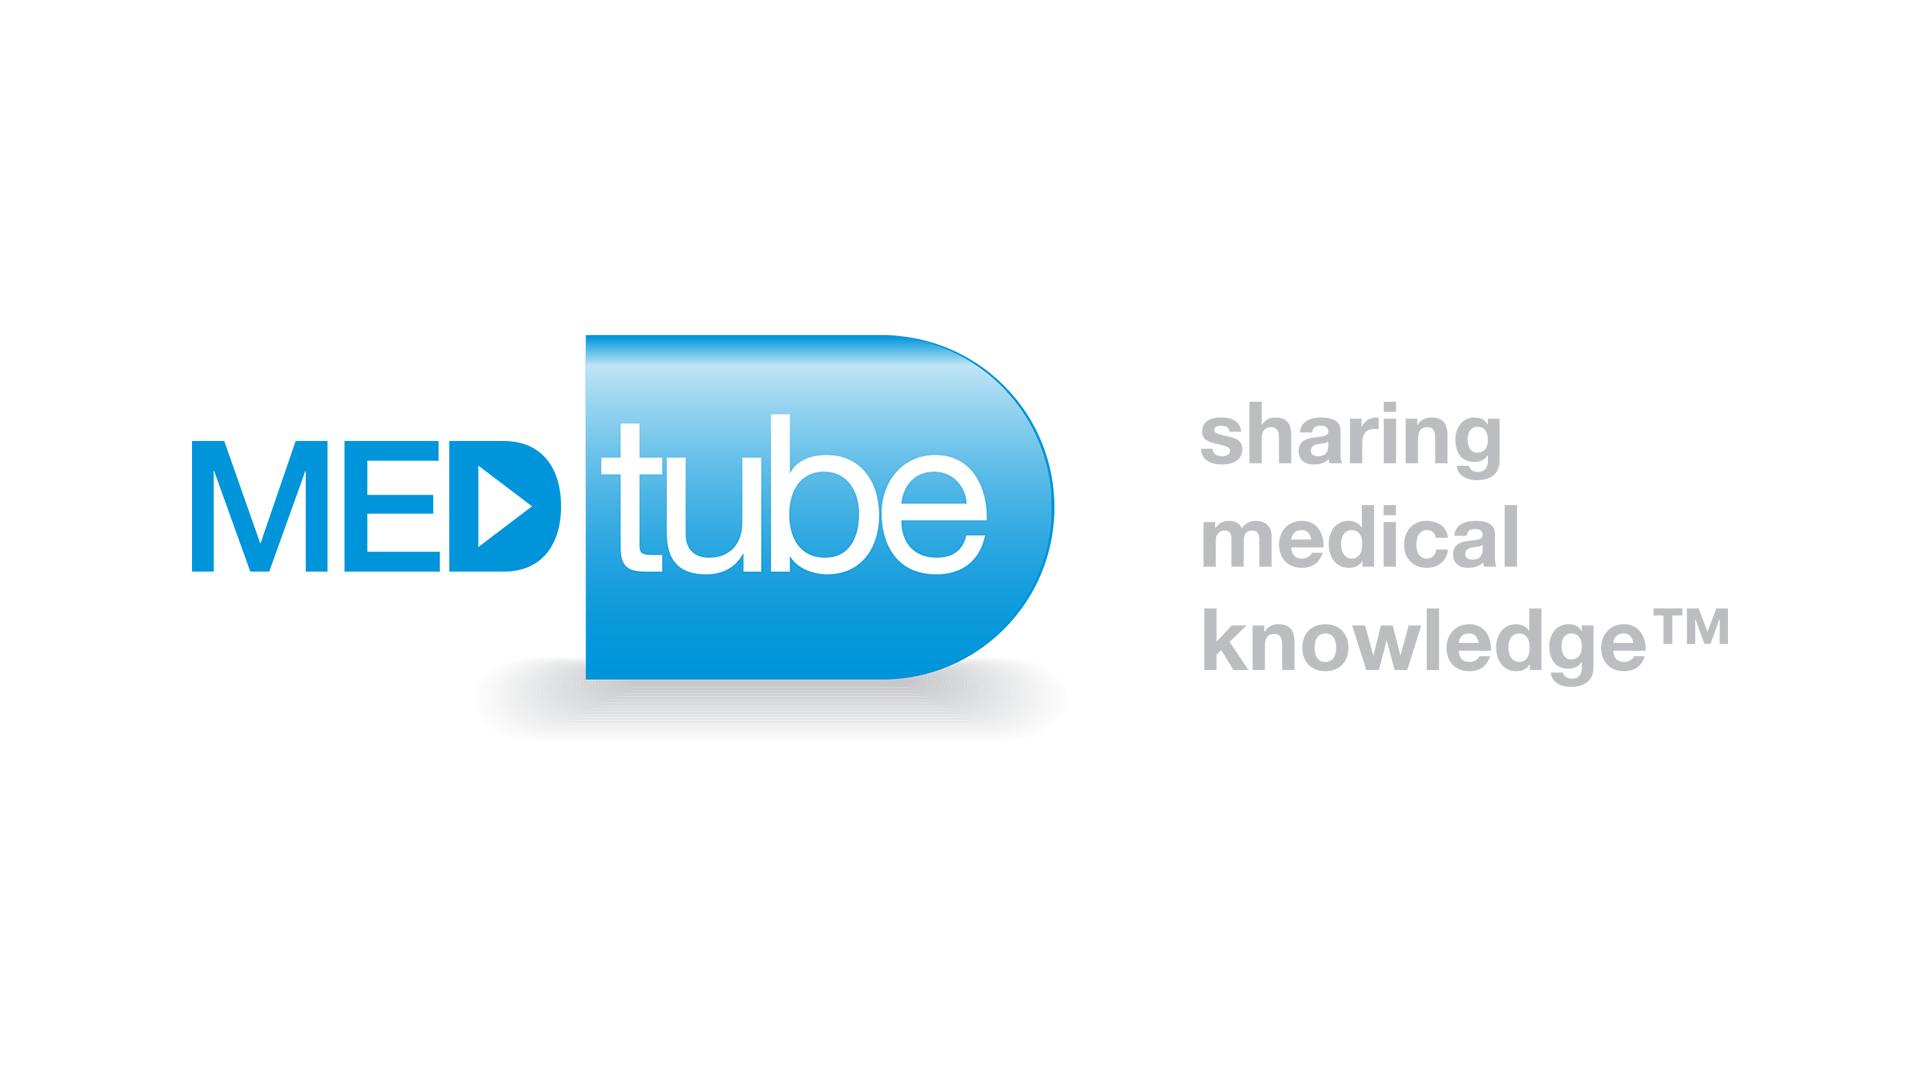 medtube-logo-HD_BioTech_Pharma_Summit